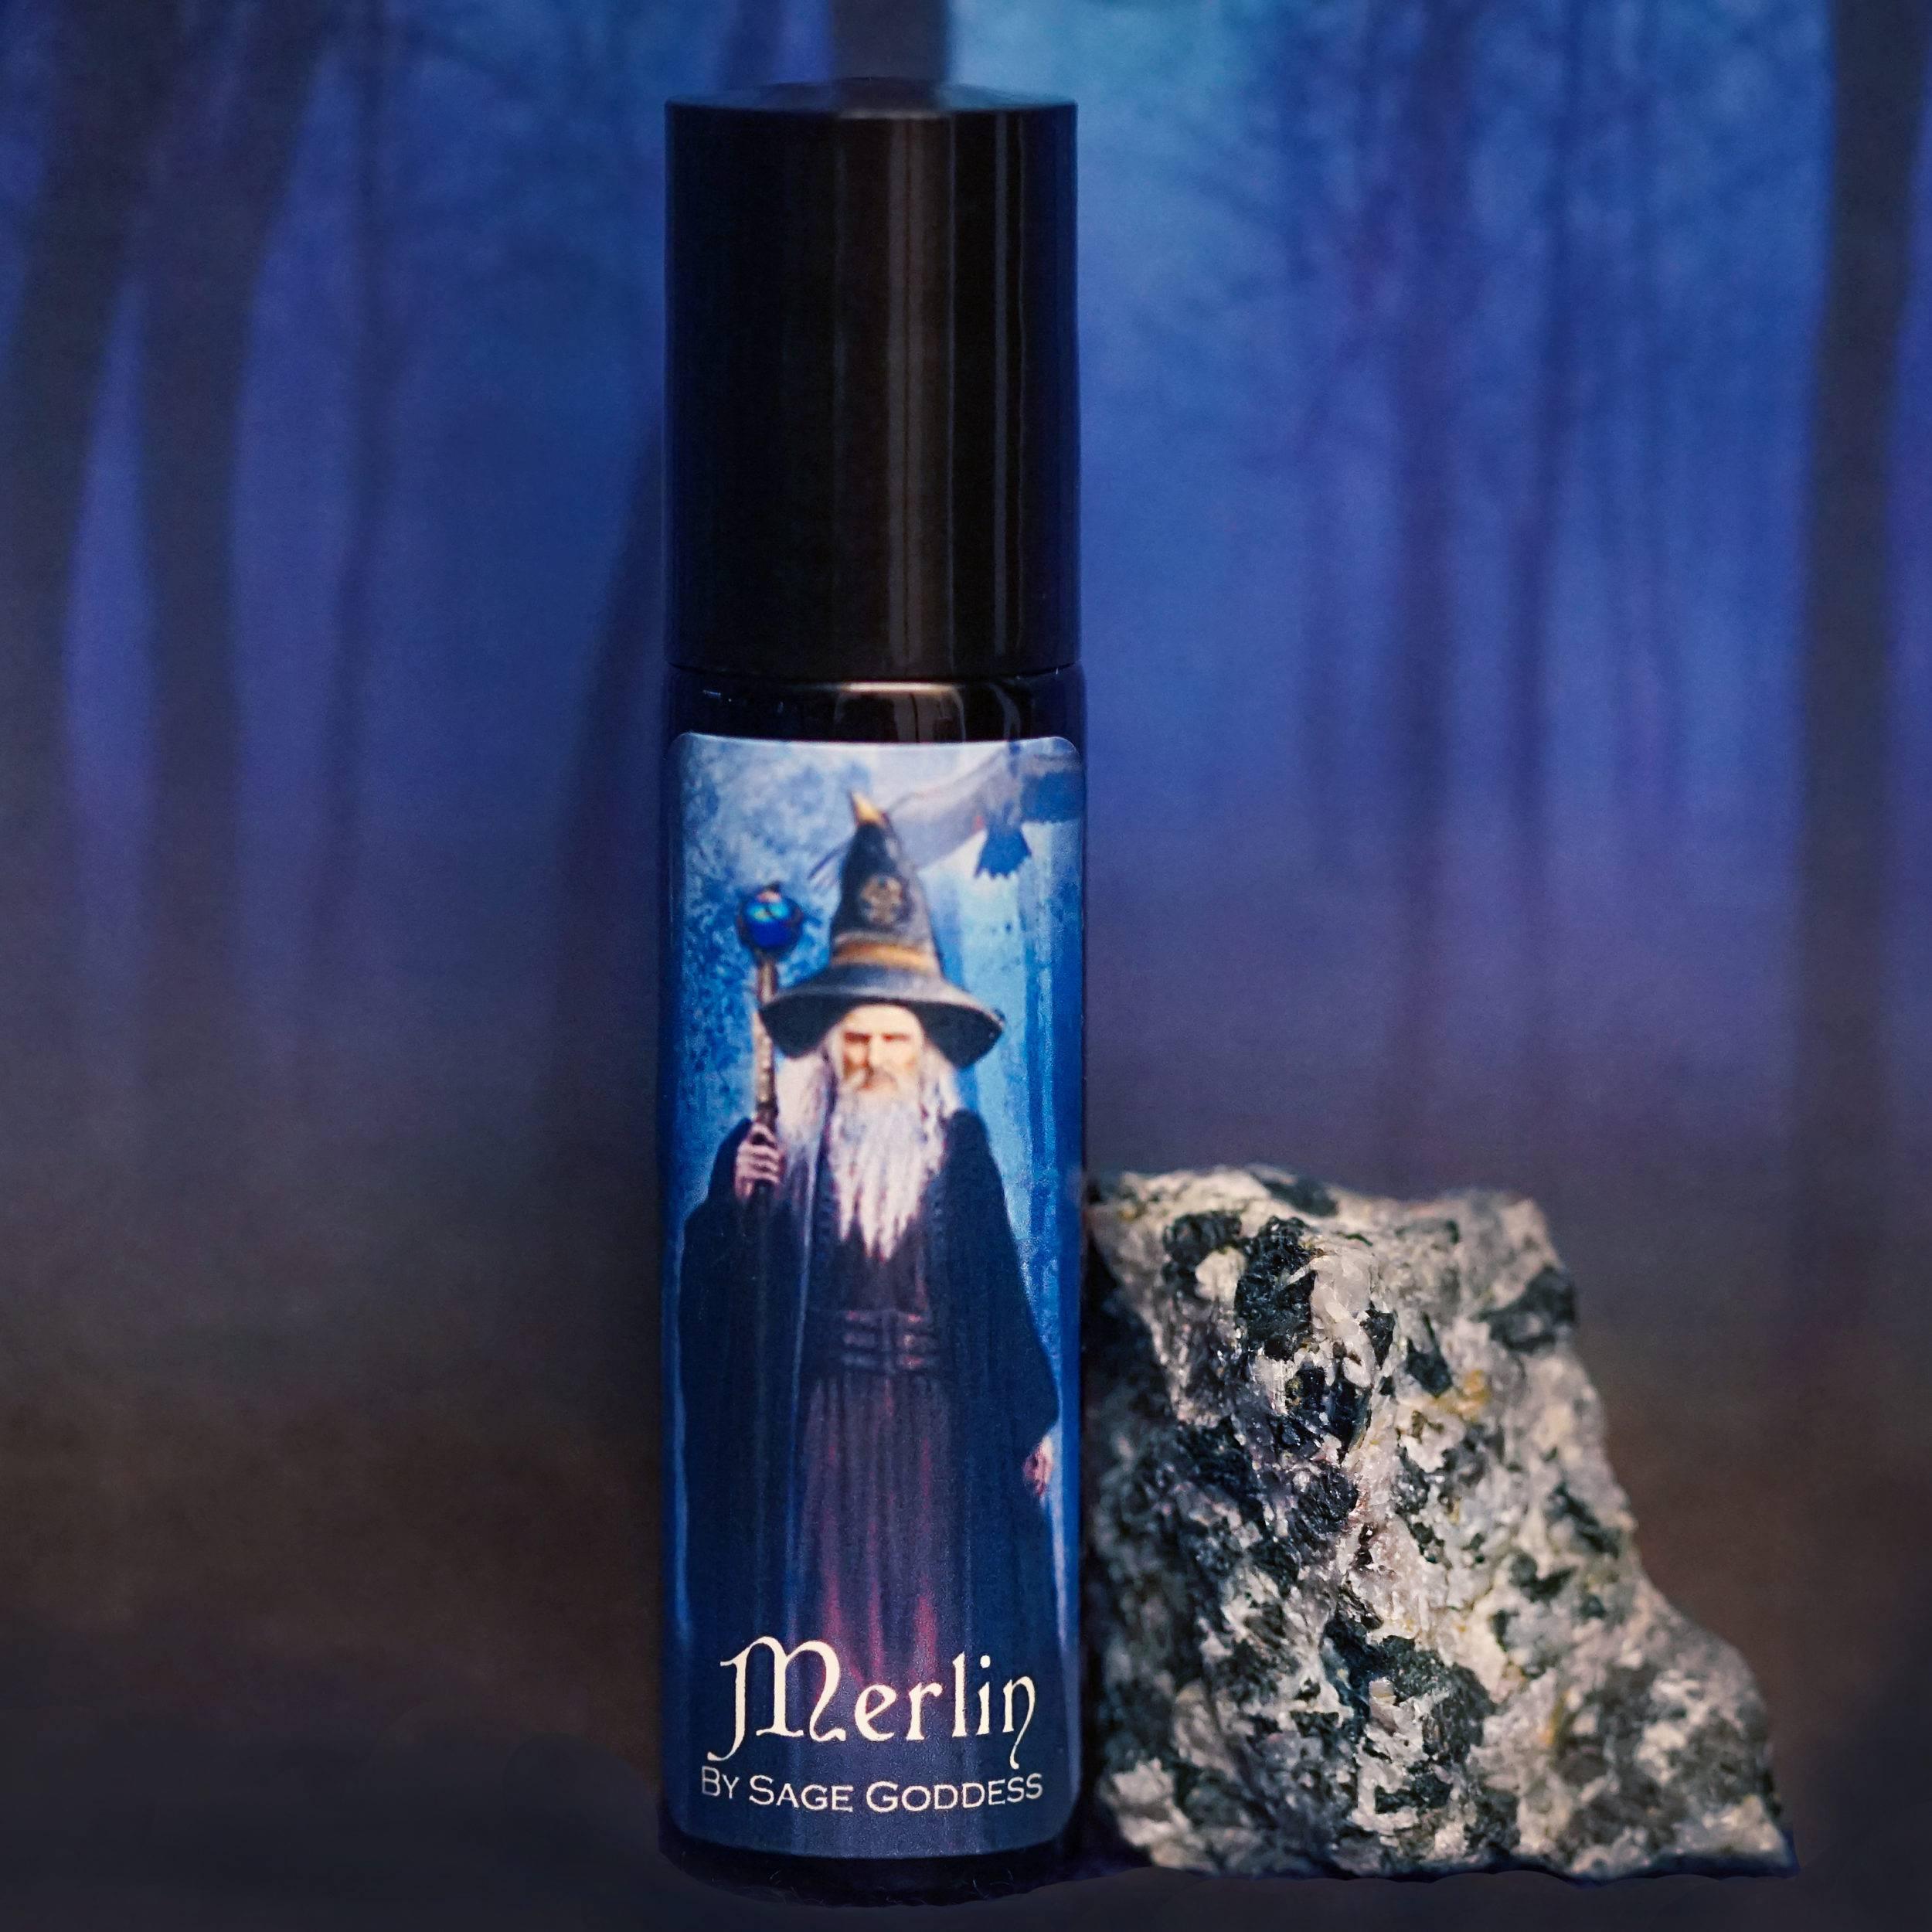 Merlin perfume with natural merlinite